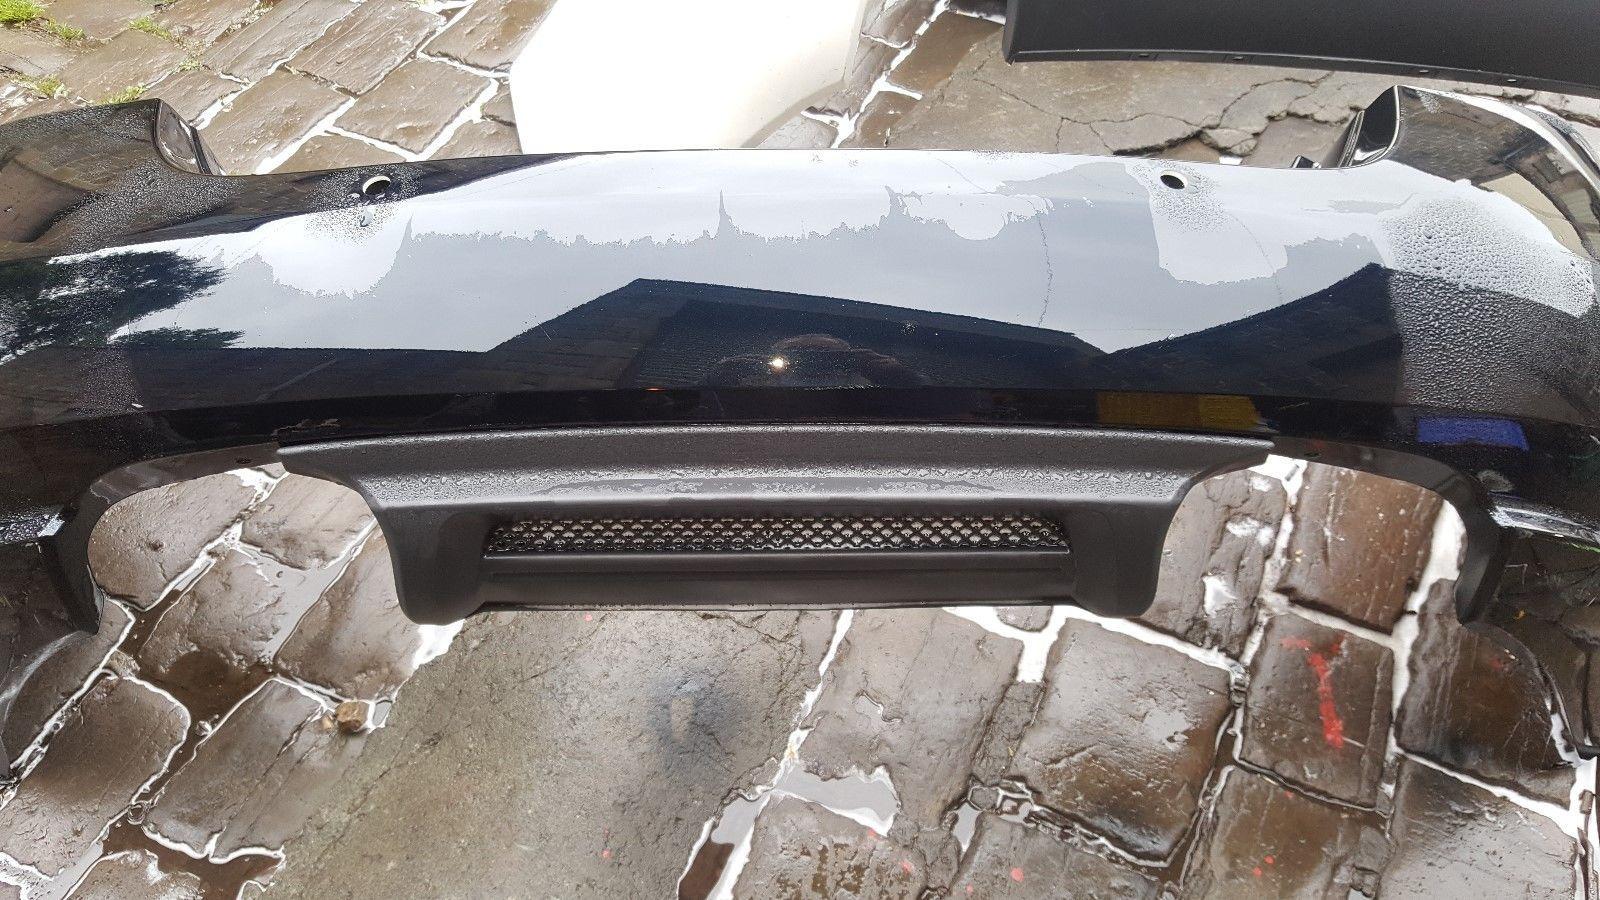 S5 Interruptor START-STOP original Audi A4 A5 Q5 Interruptor de presi/ón 8k0905217c Variante S S4